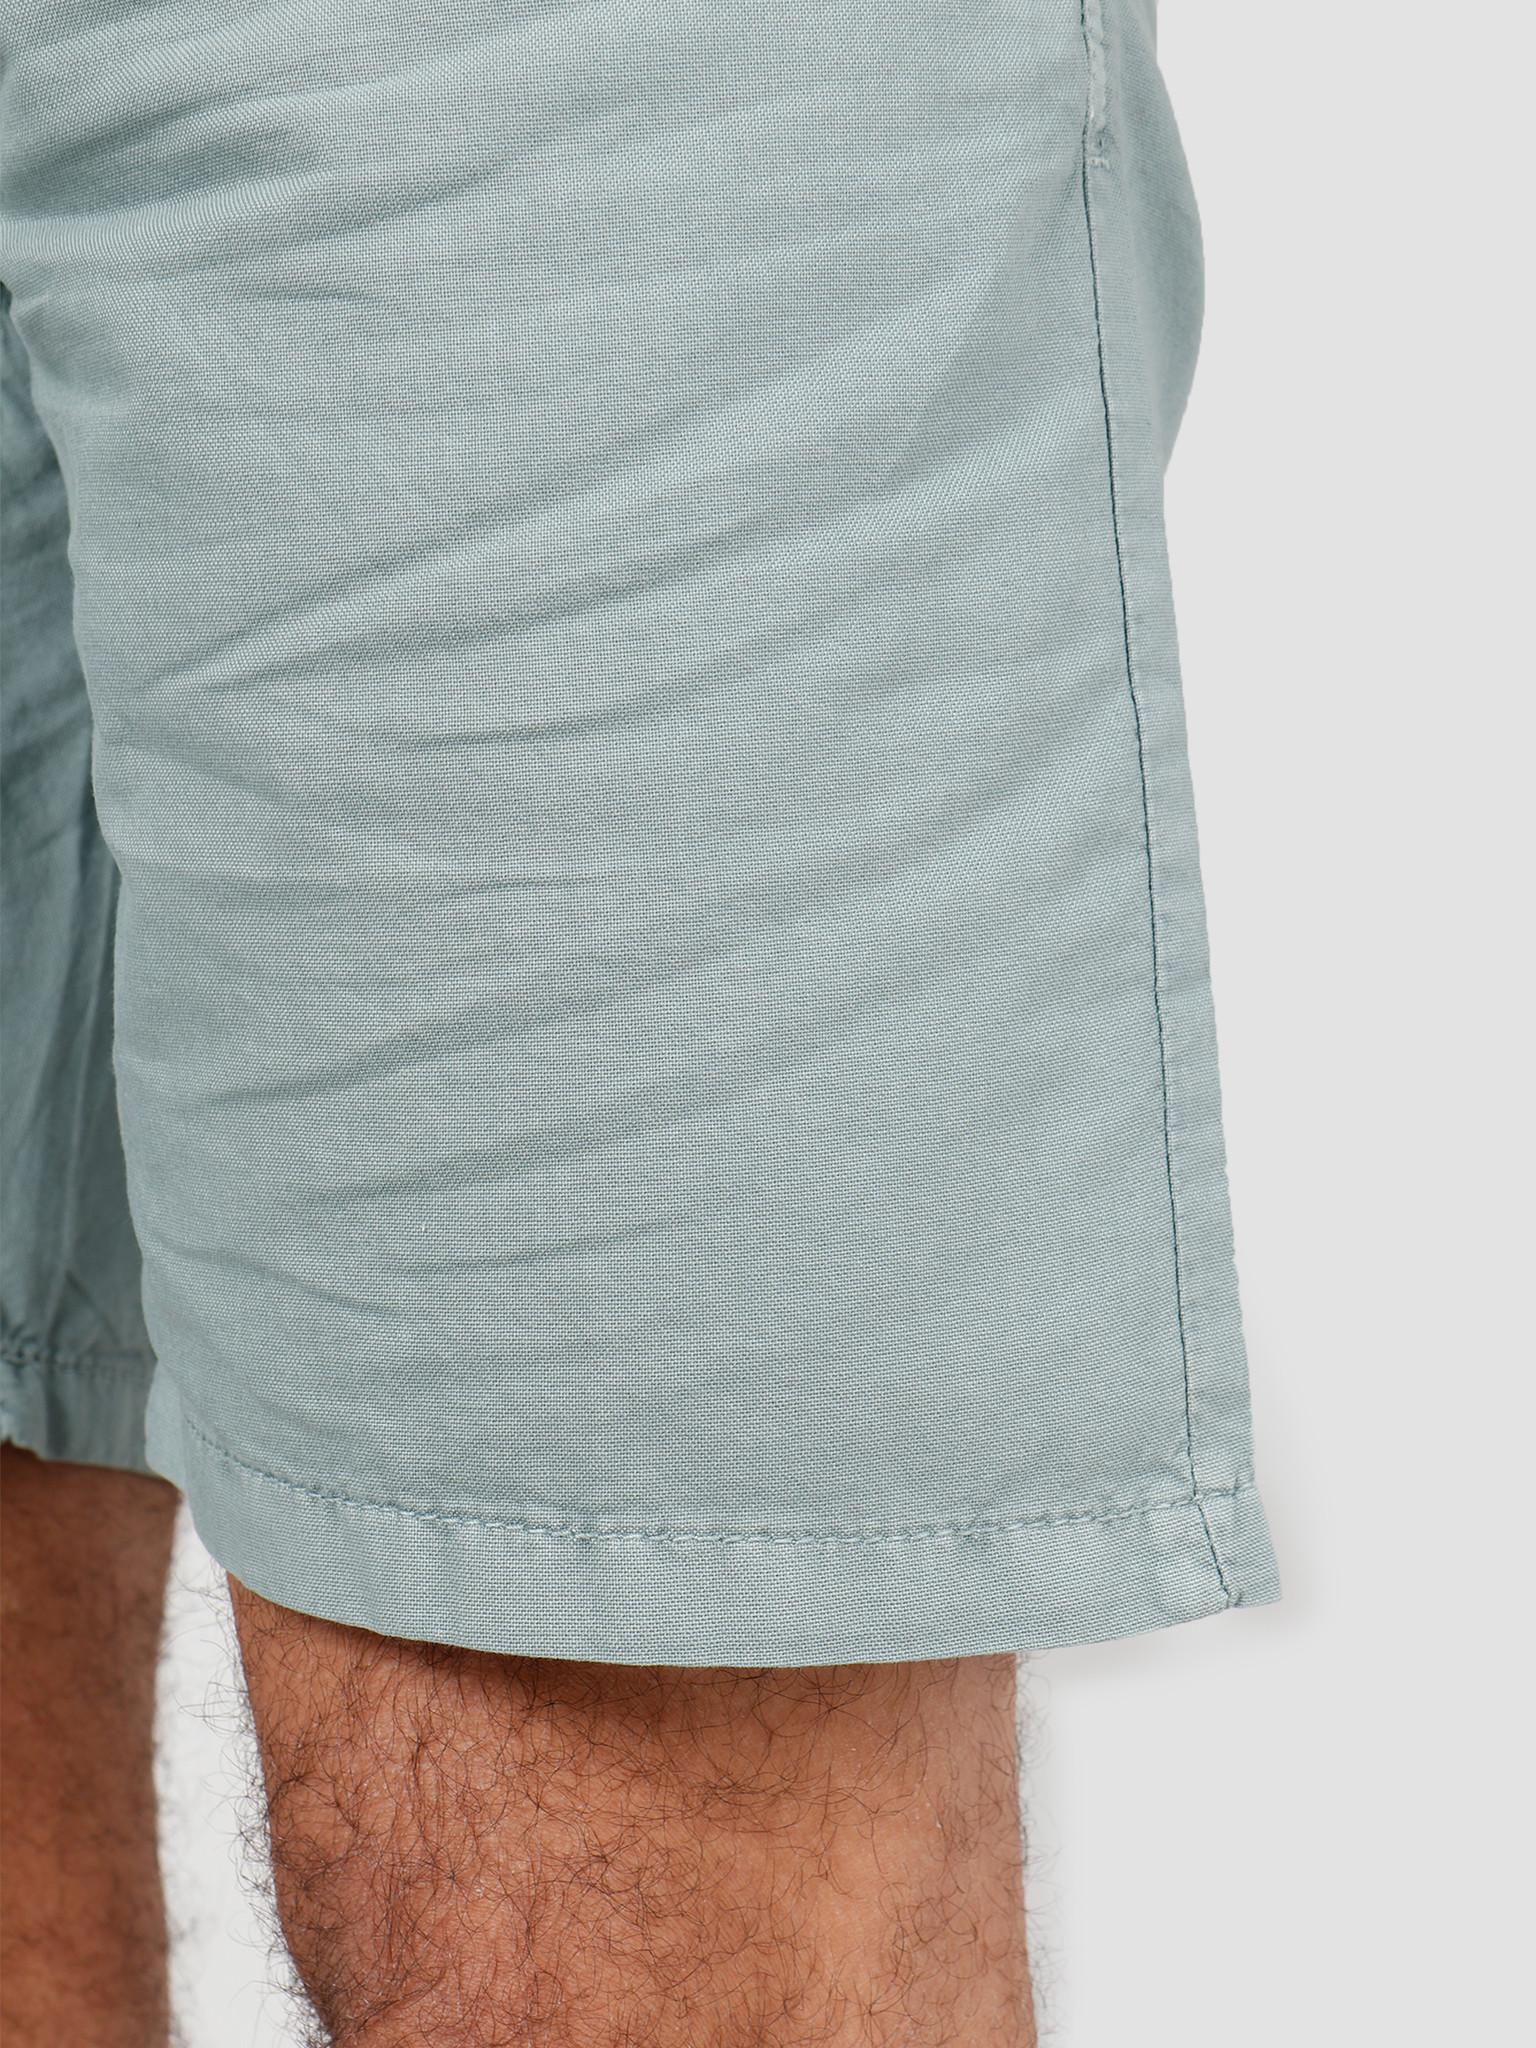 Kronstadt Kronstadt Jonas Oxford Dyed Shirt Lead KS2686